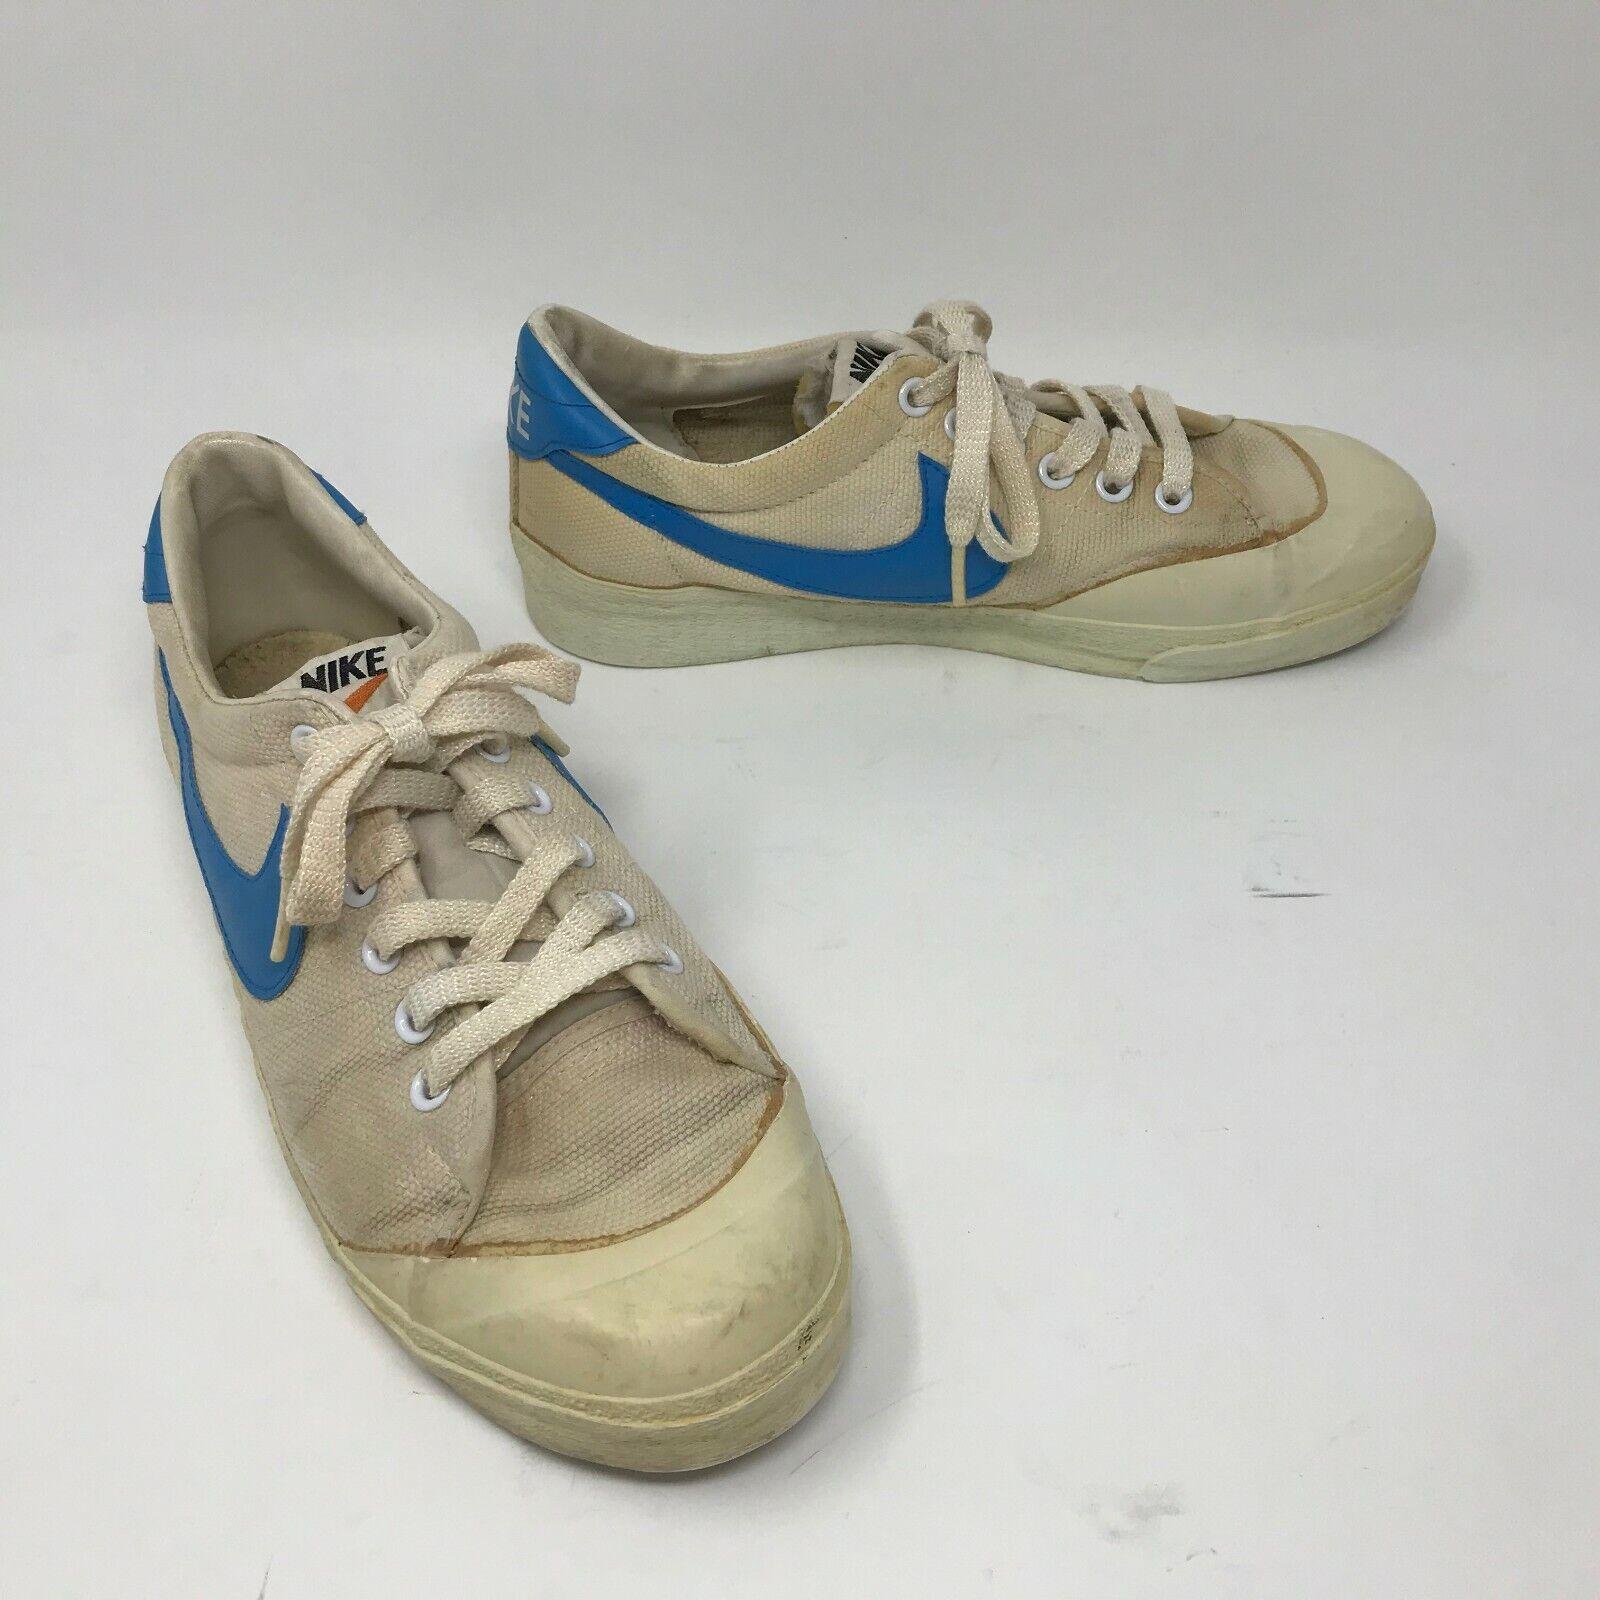 RARE Vintage Original 1986 Nike Court